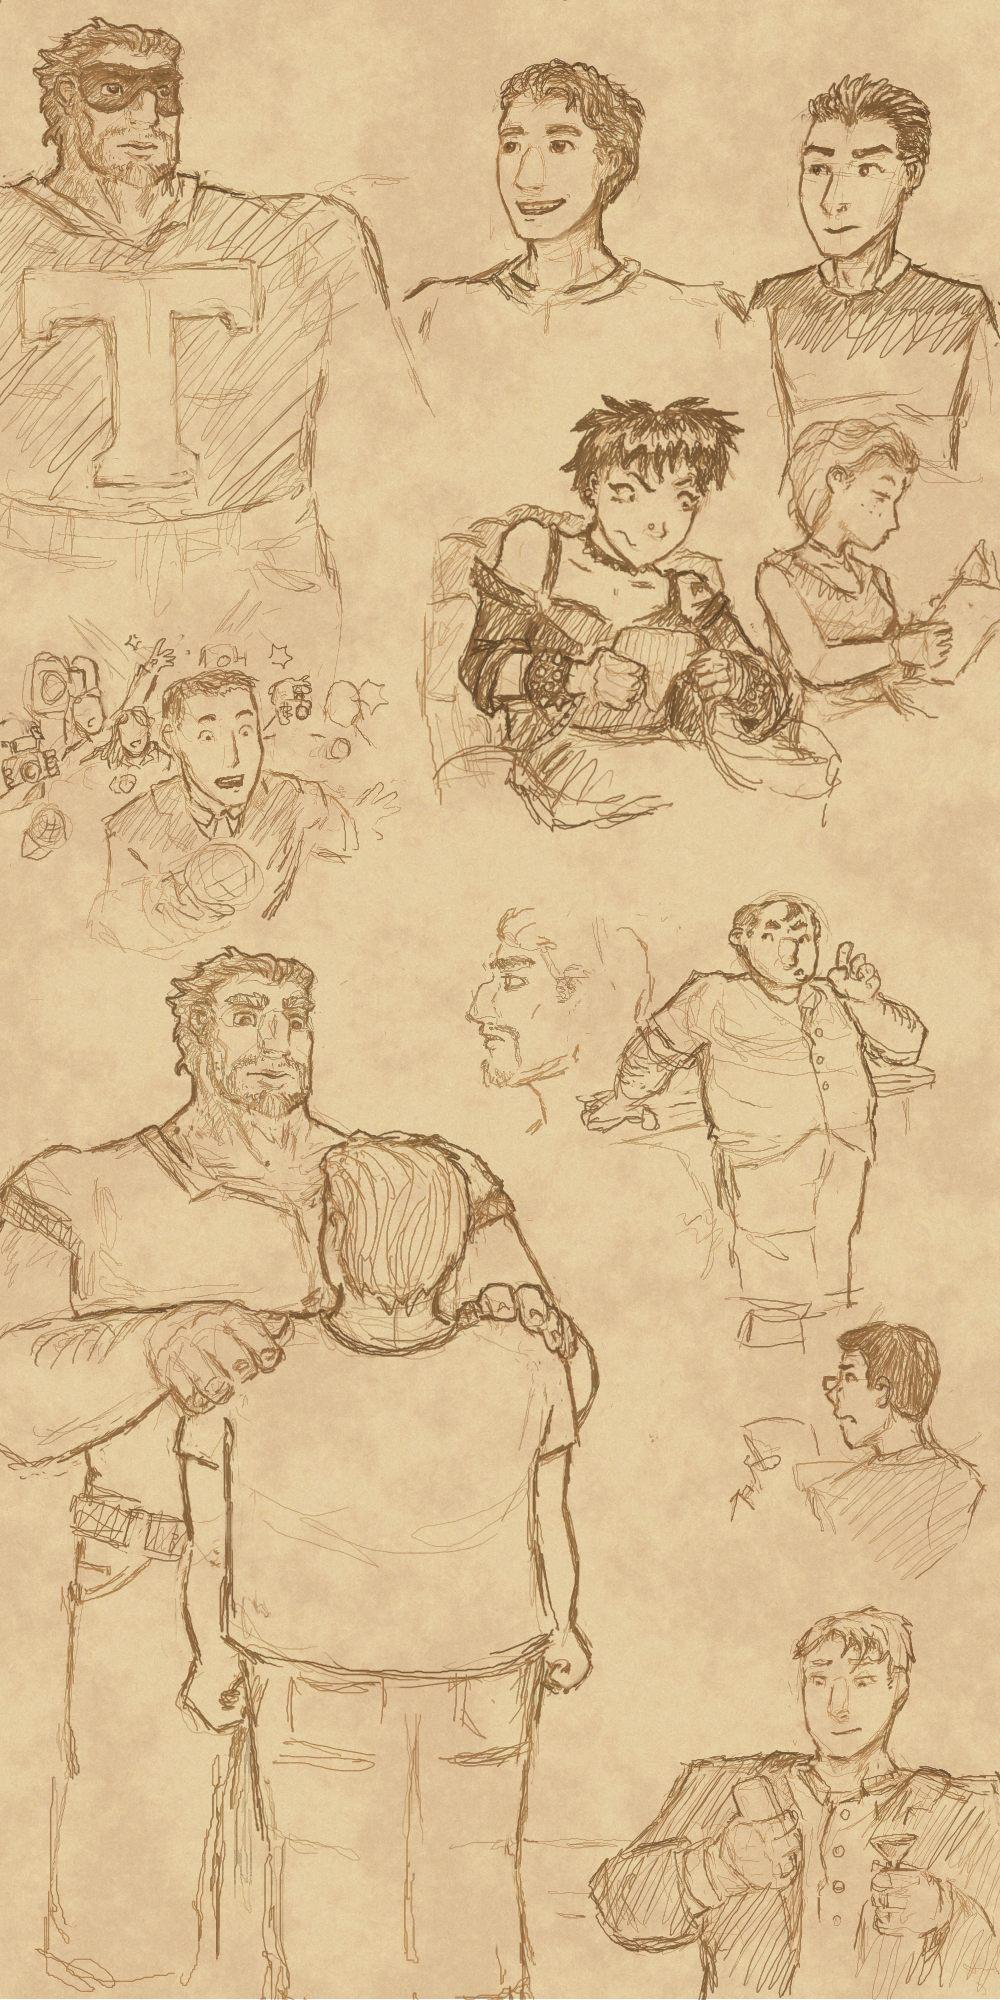 Fanart: Titan, from Drew Hayes' Corpies